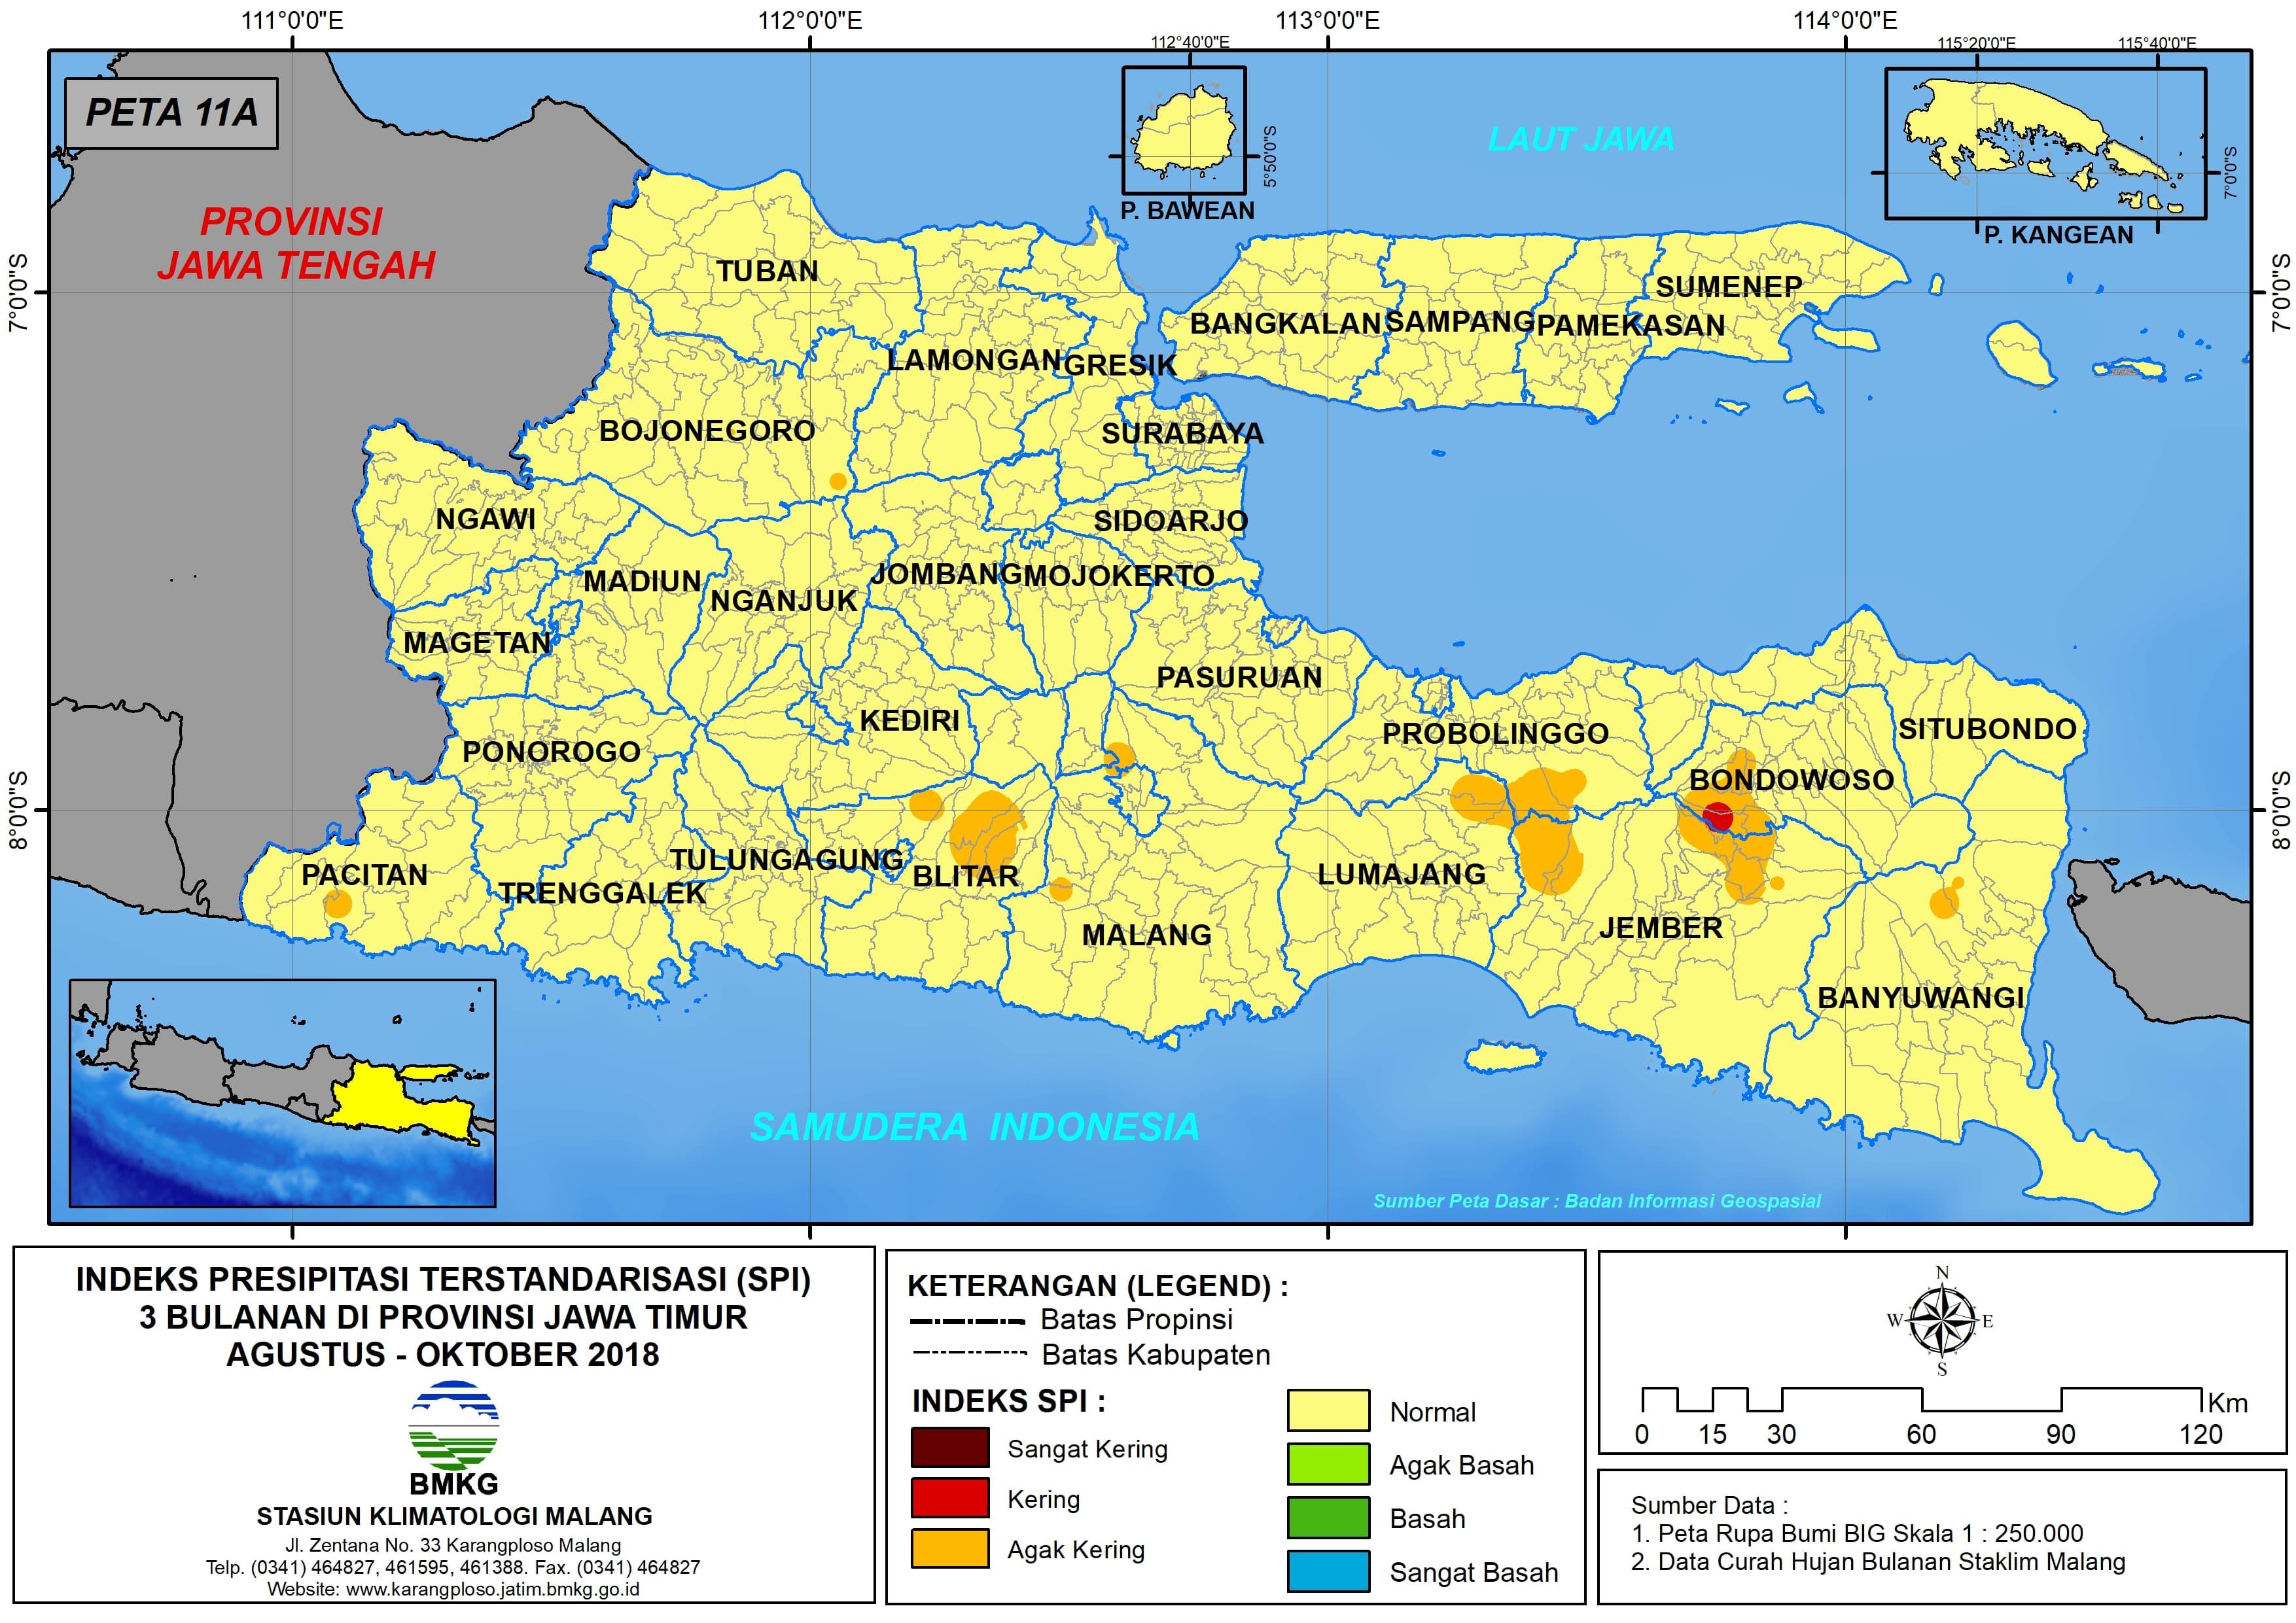 Analisis Indeks Presipitasi Terstandarisasi SPI 3 Bulanan Untuk Bulan Agustus September Oktober Tahun 2018 di Provinsi Jawa Timur